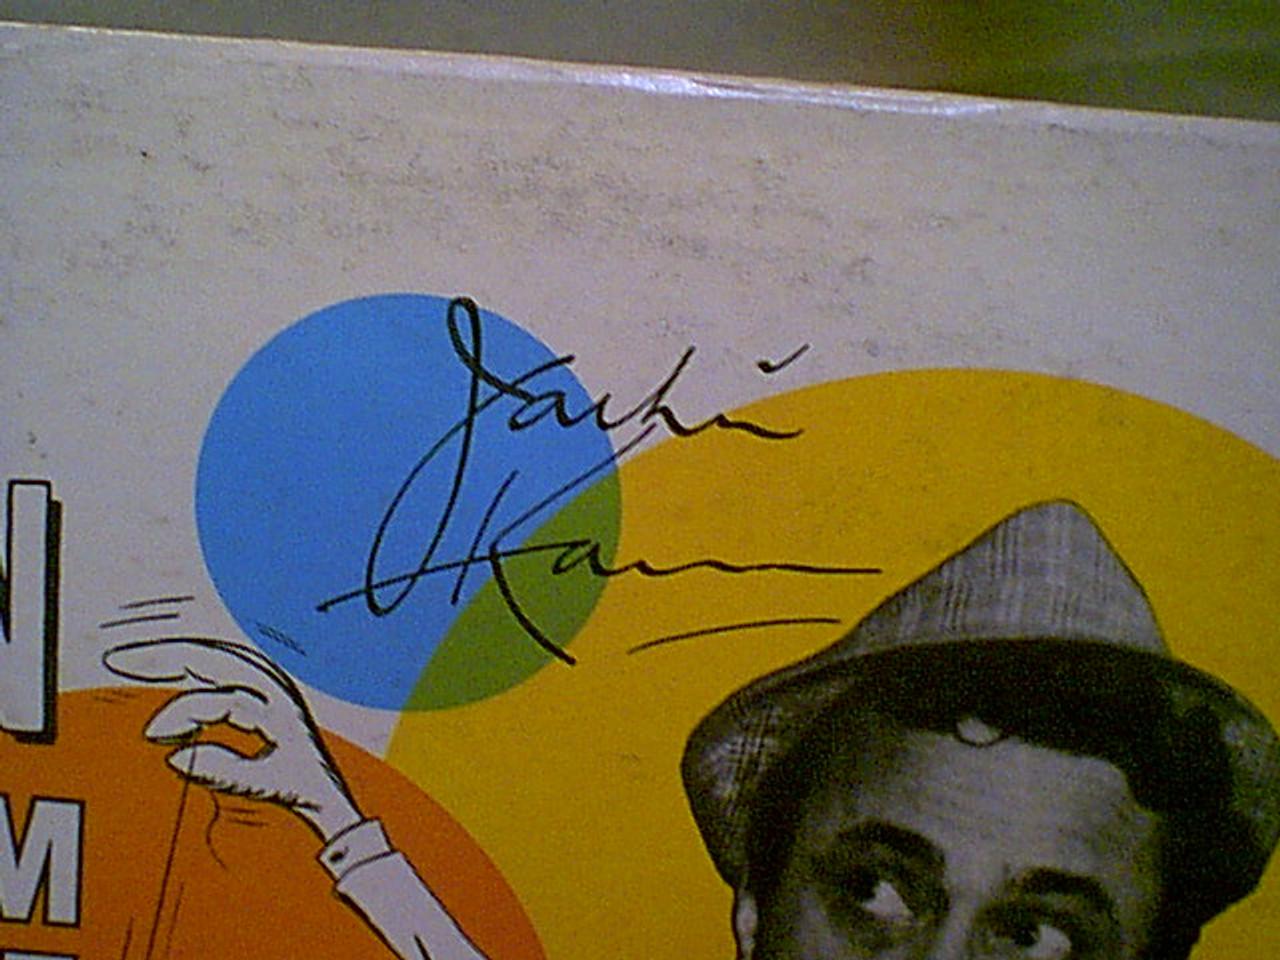 Kannon, Jackie LP Signed Autograph Live From The Ratfink Room Roulette